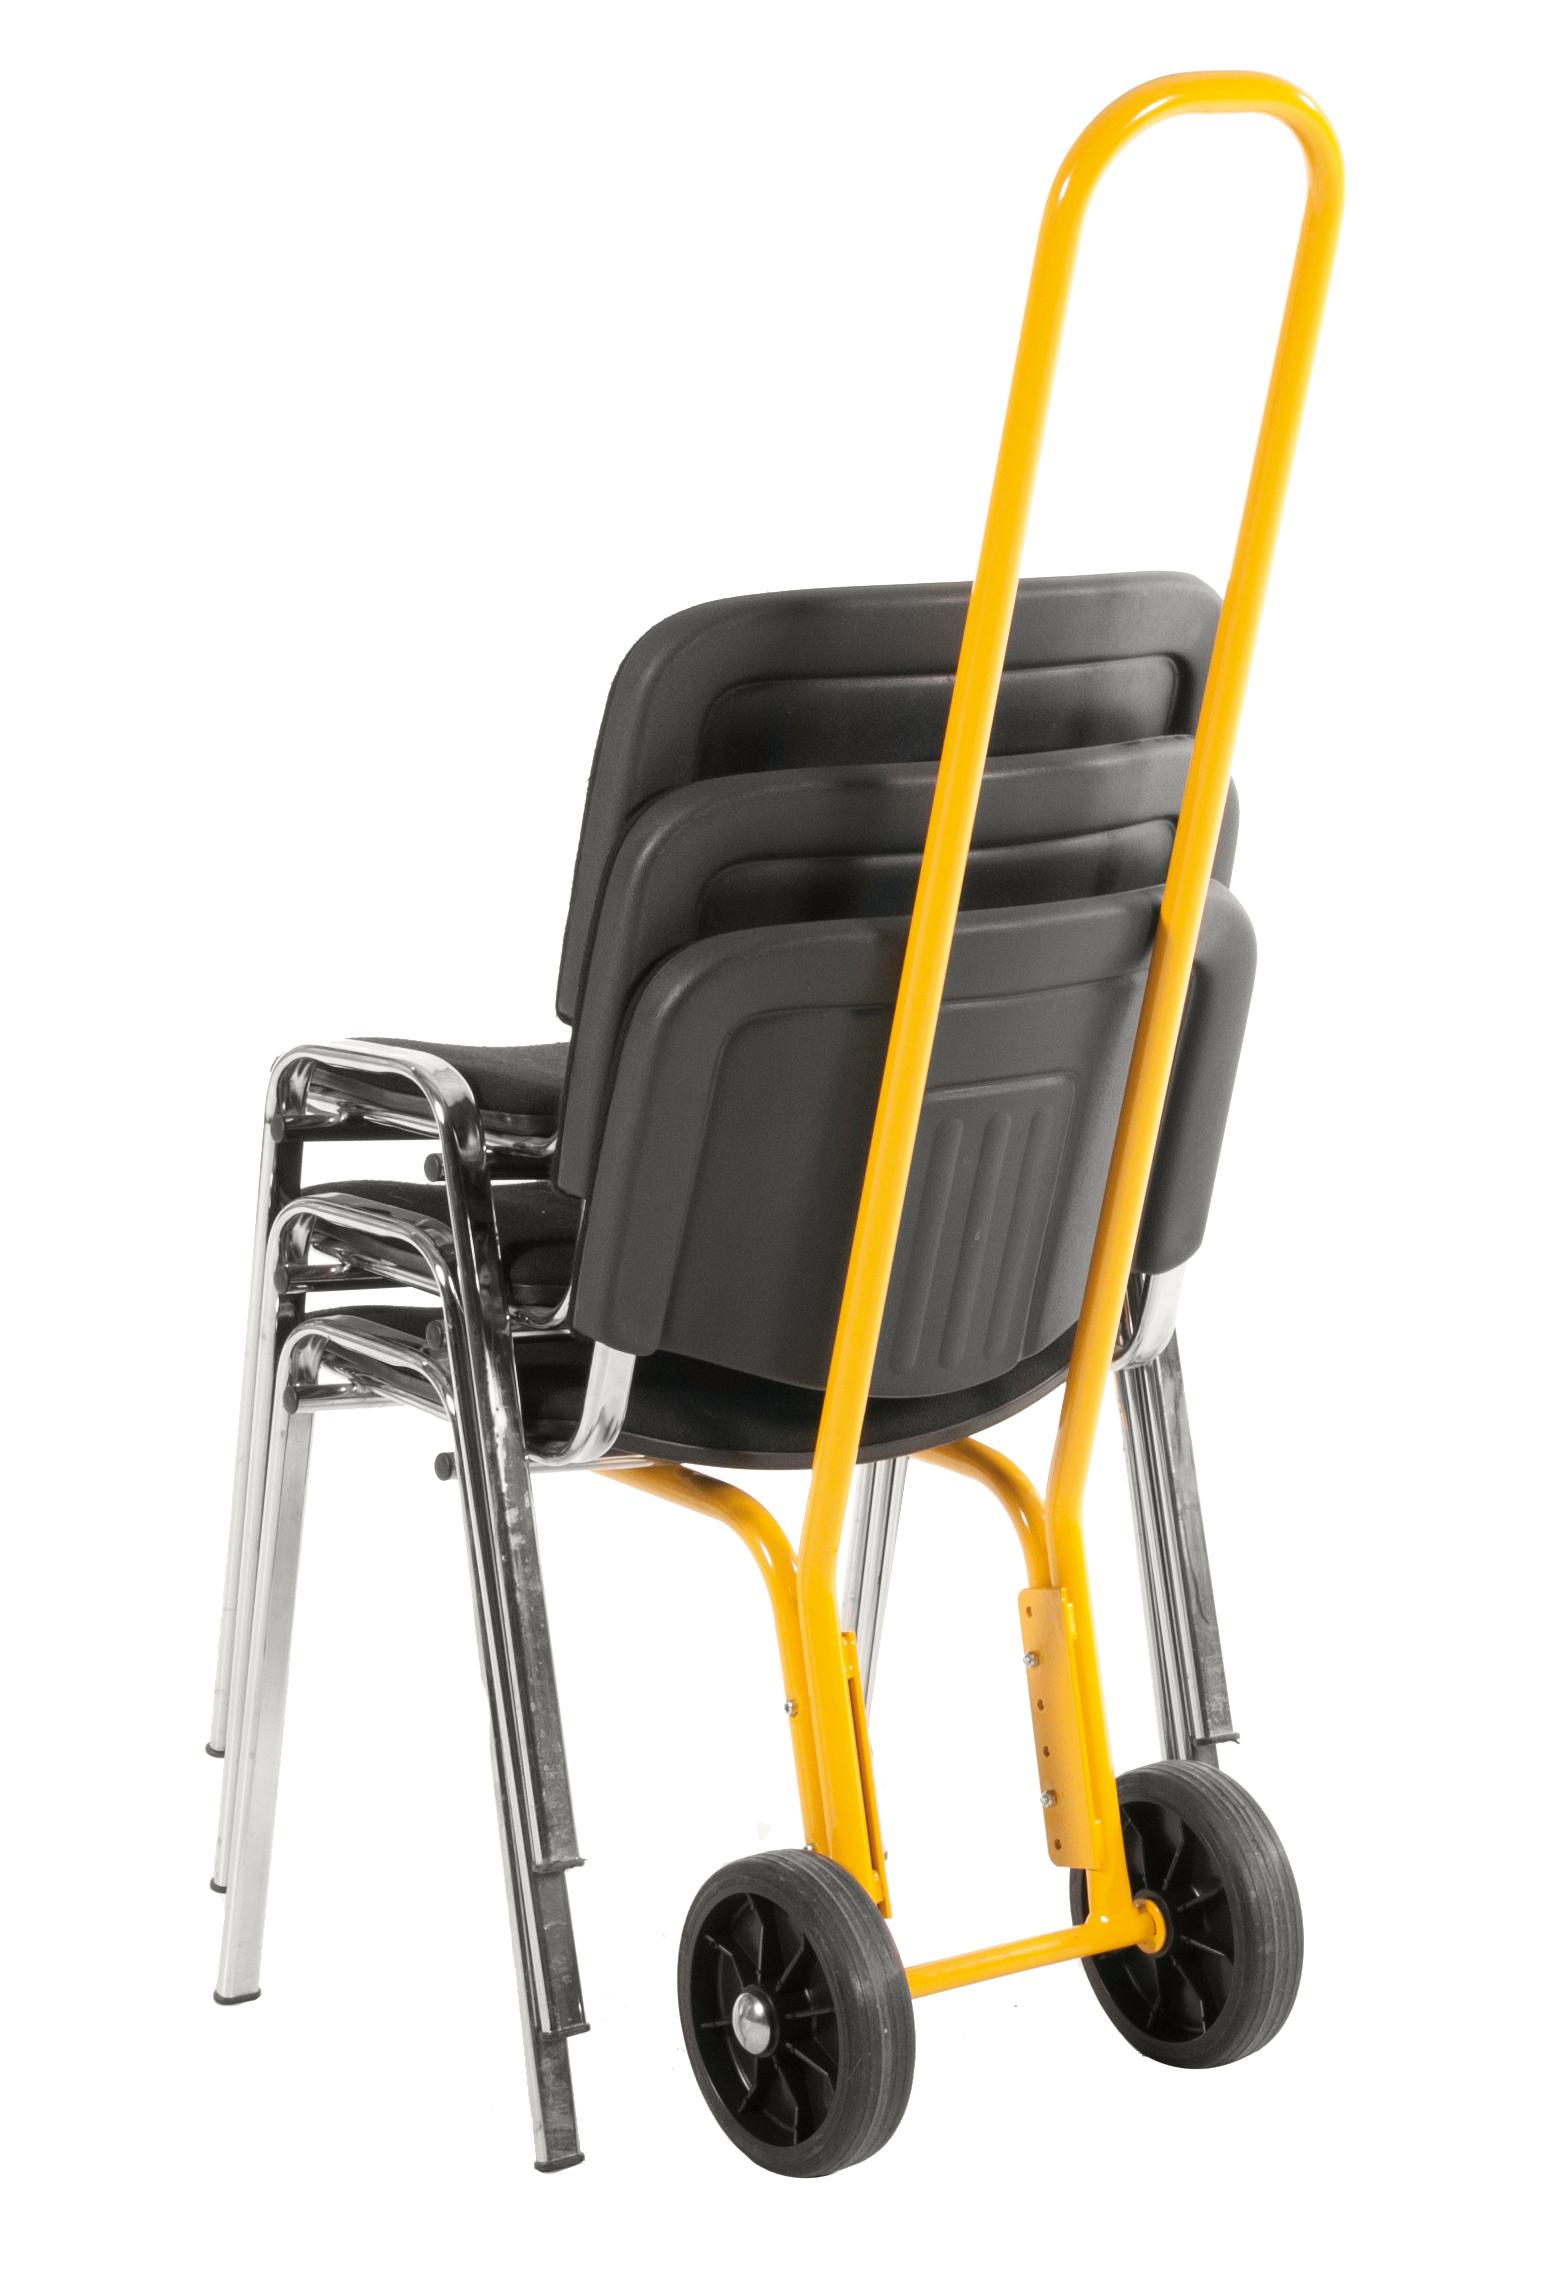 KM145730 | Chair truck